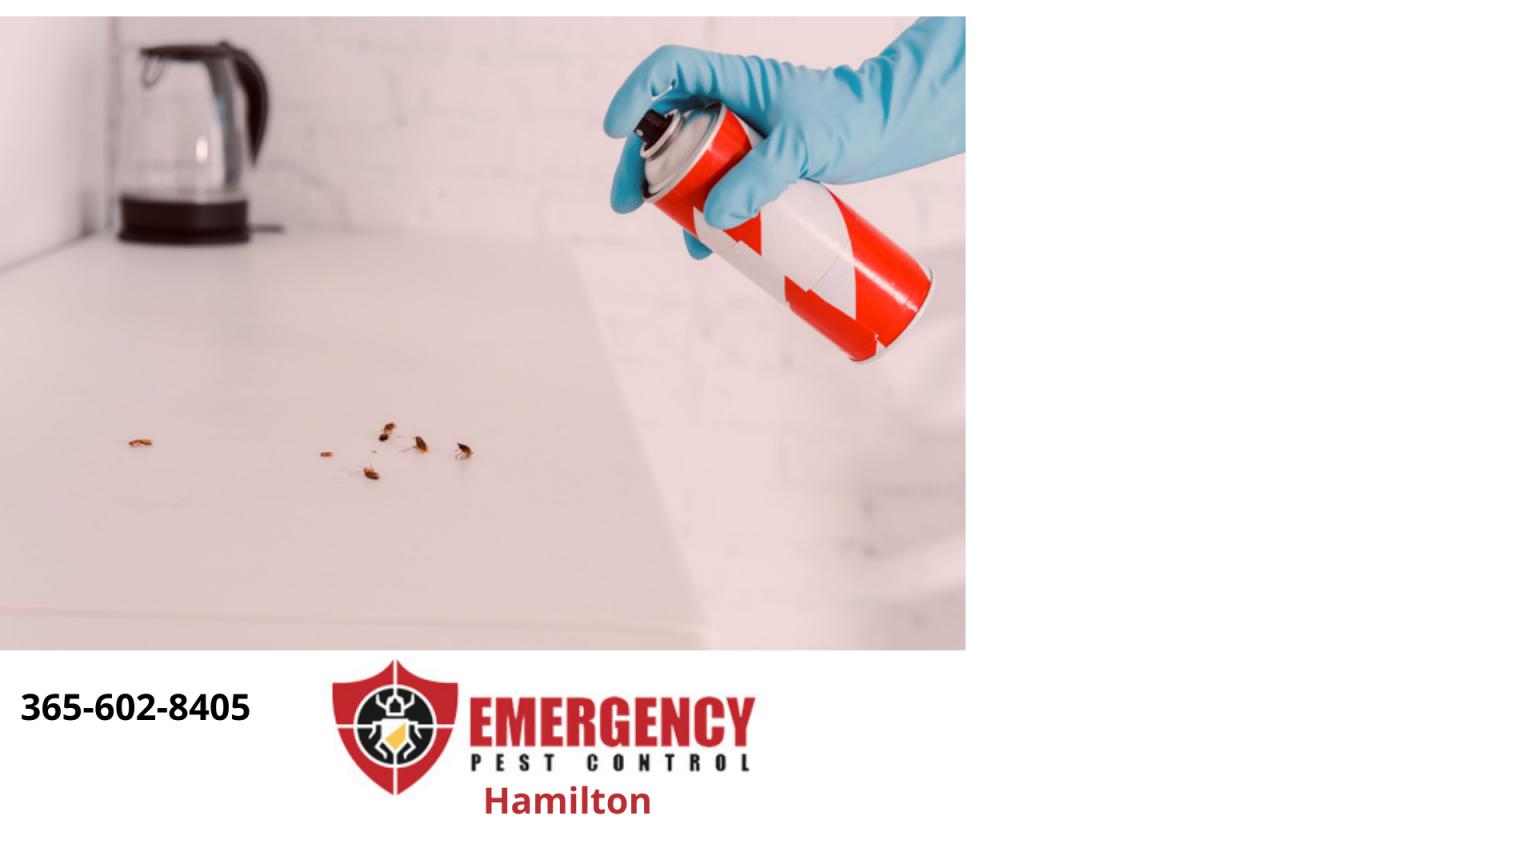 Hamilton-5-1536x864